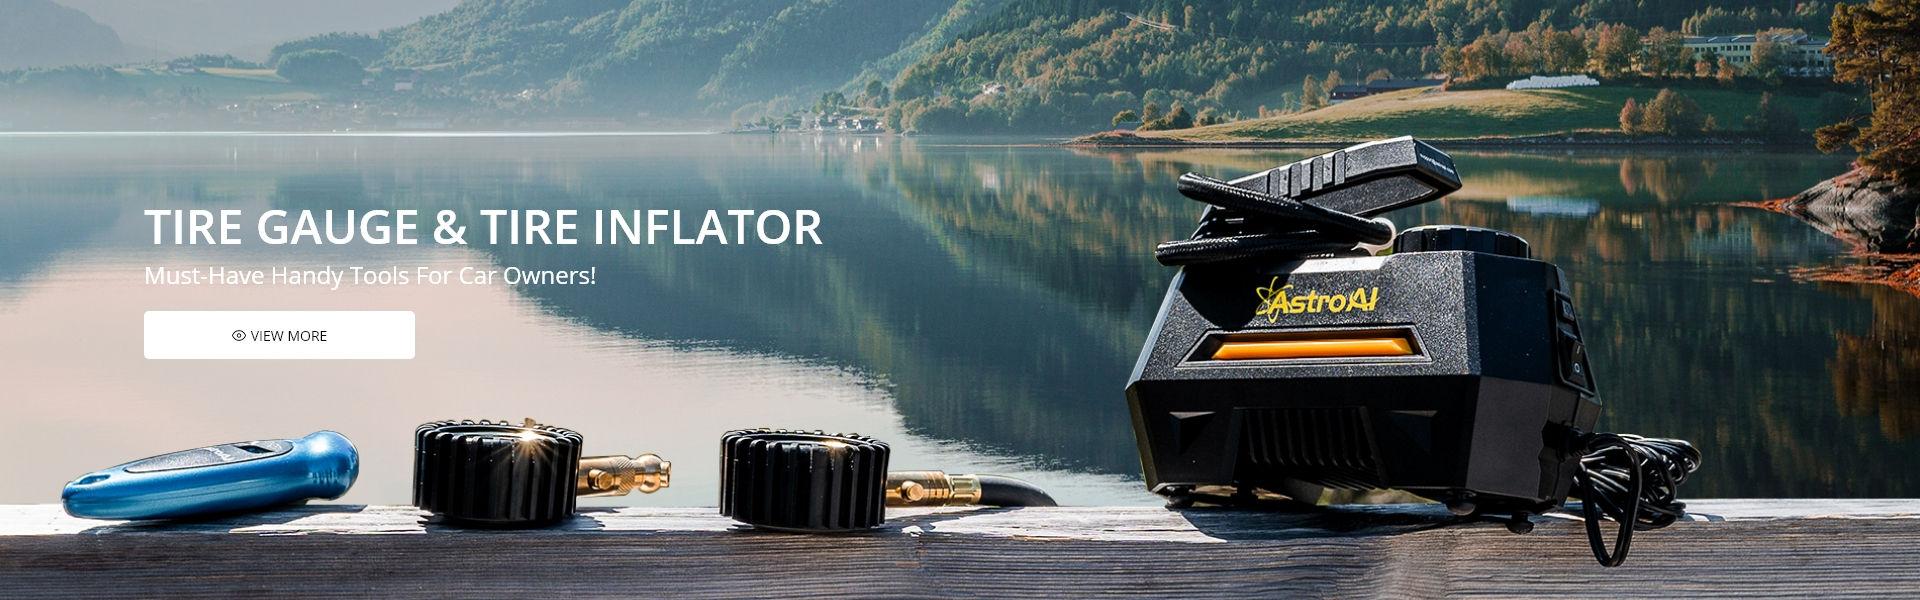 Tire Gauge & Tire Inflator